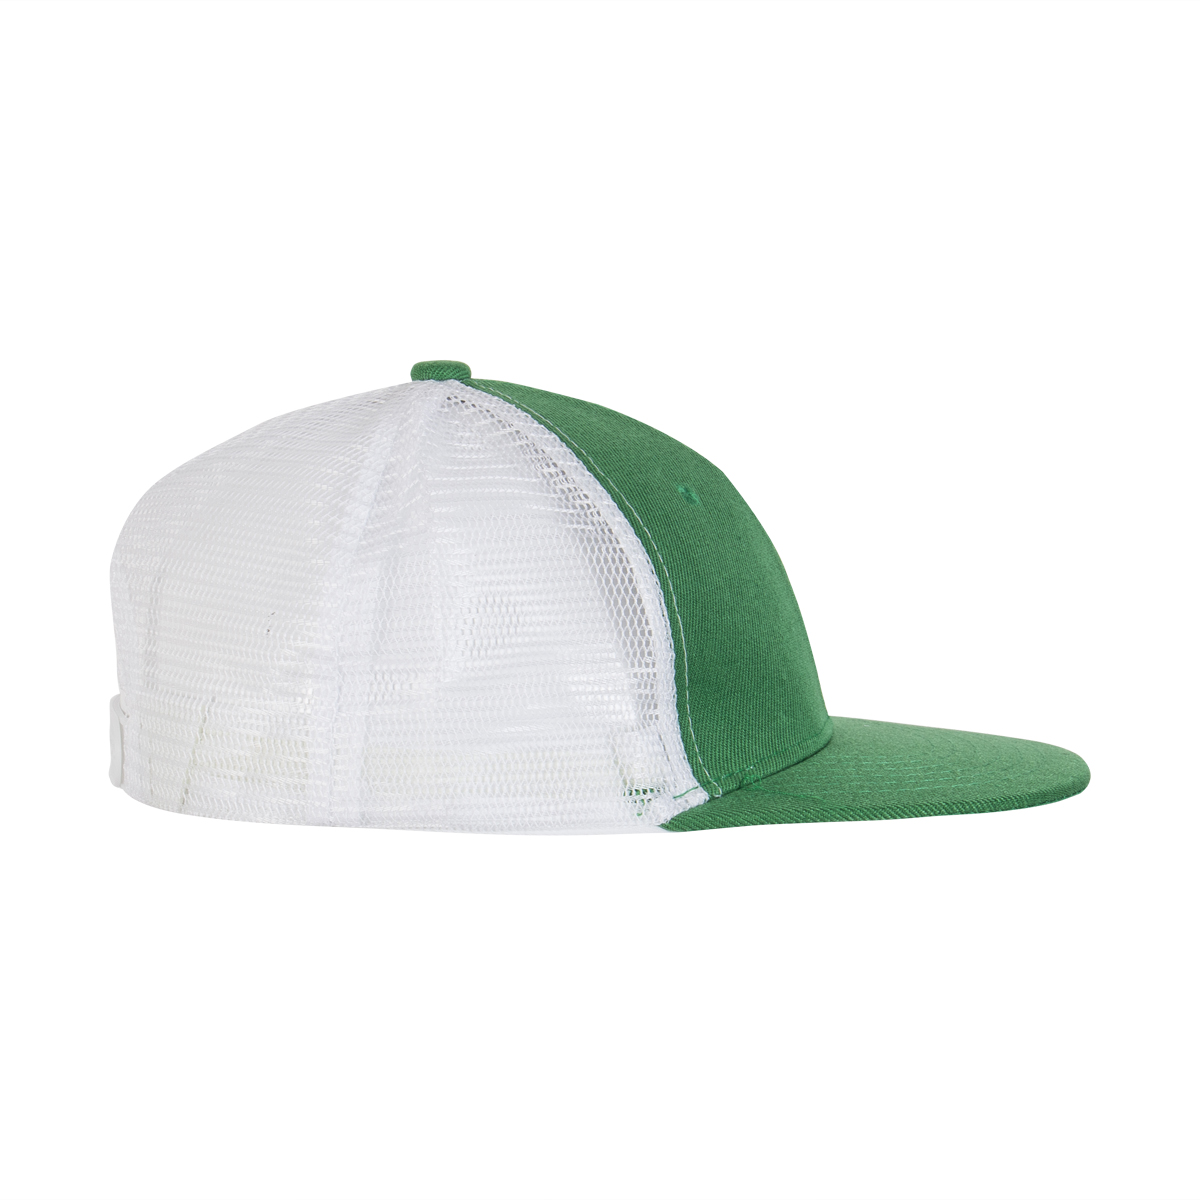 Adjustable Snapback Trucker Baseball-Cap Travel-Hat Mesh Black New-Style Women Summer